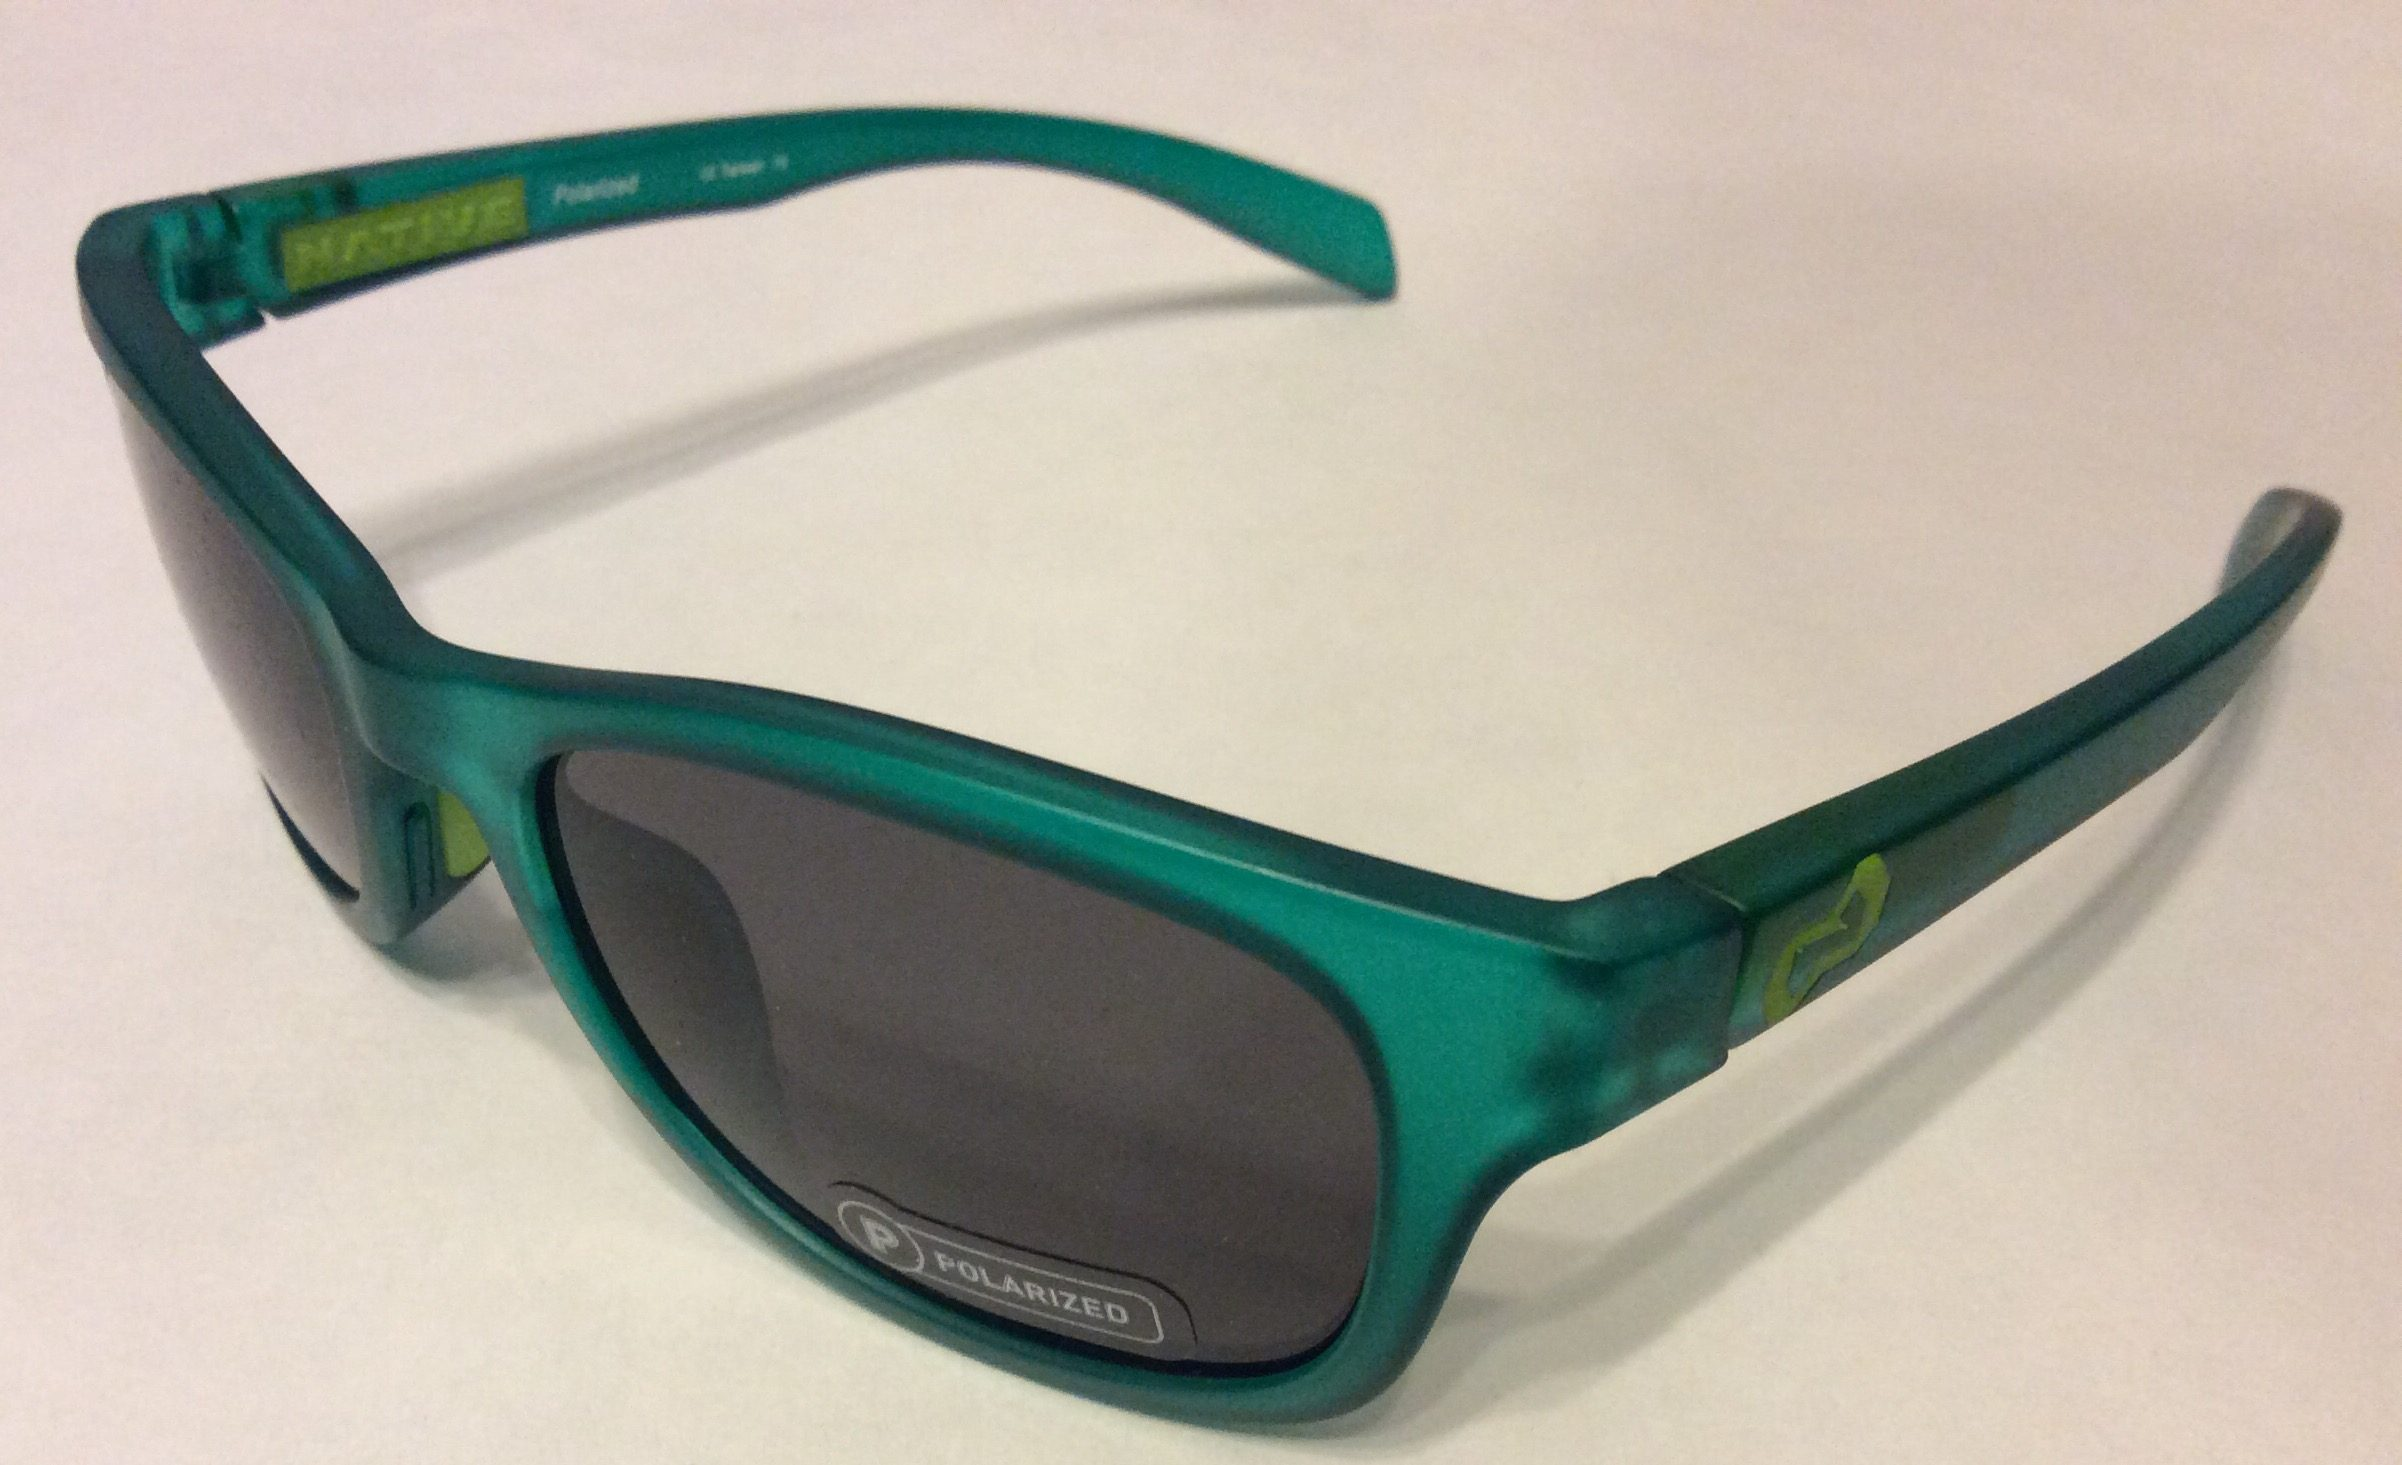 8b65699cb2 Native Eyewear Highline Sunglasses - Evergreen Frost POLARIZED N3 Gray